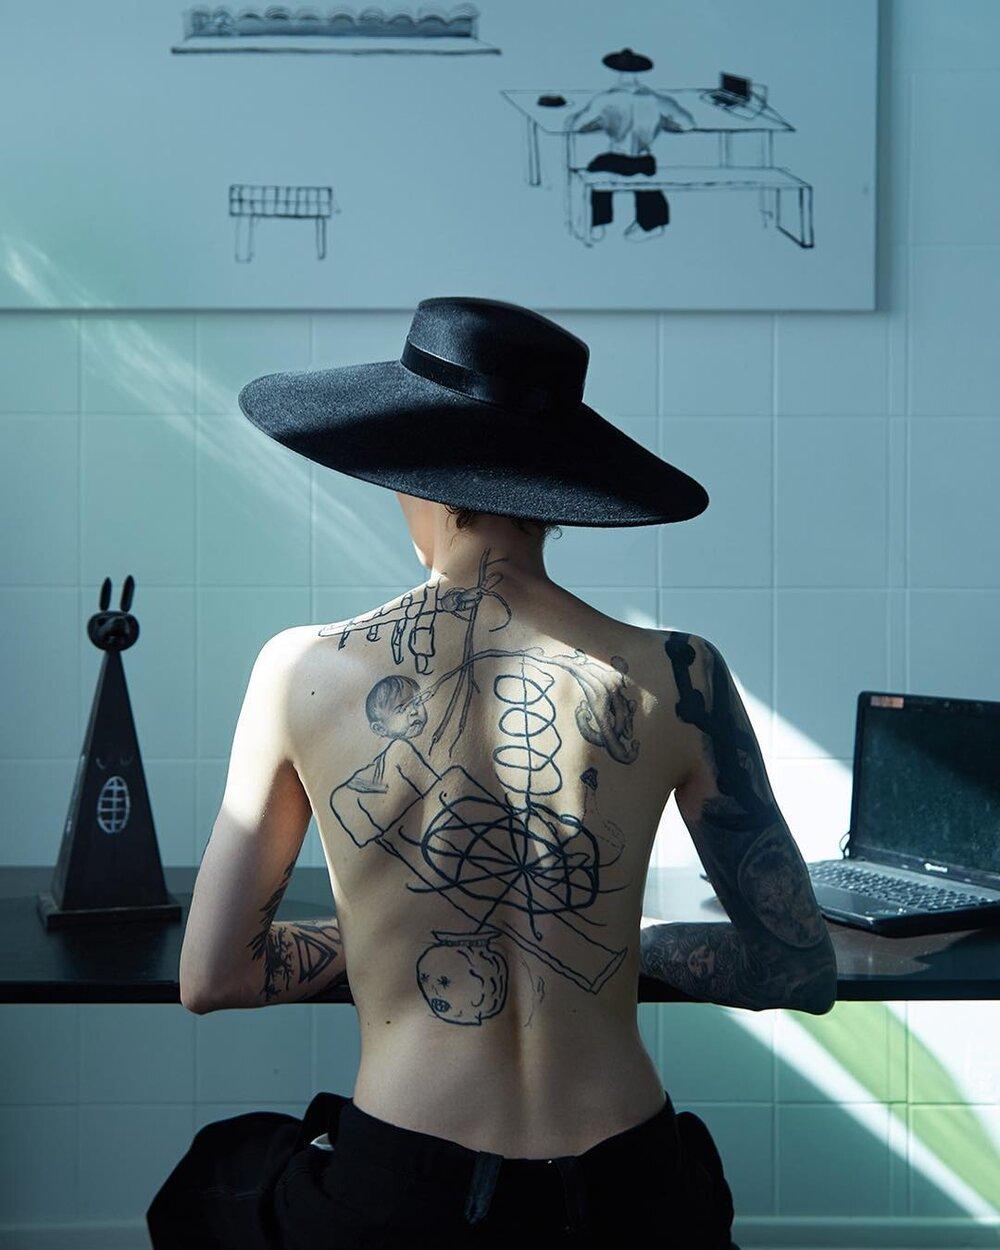 ilia-zharkov-tattoos-1.jpeg